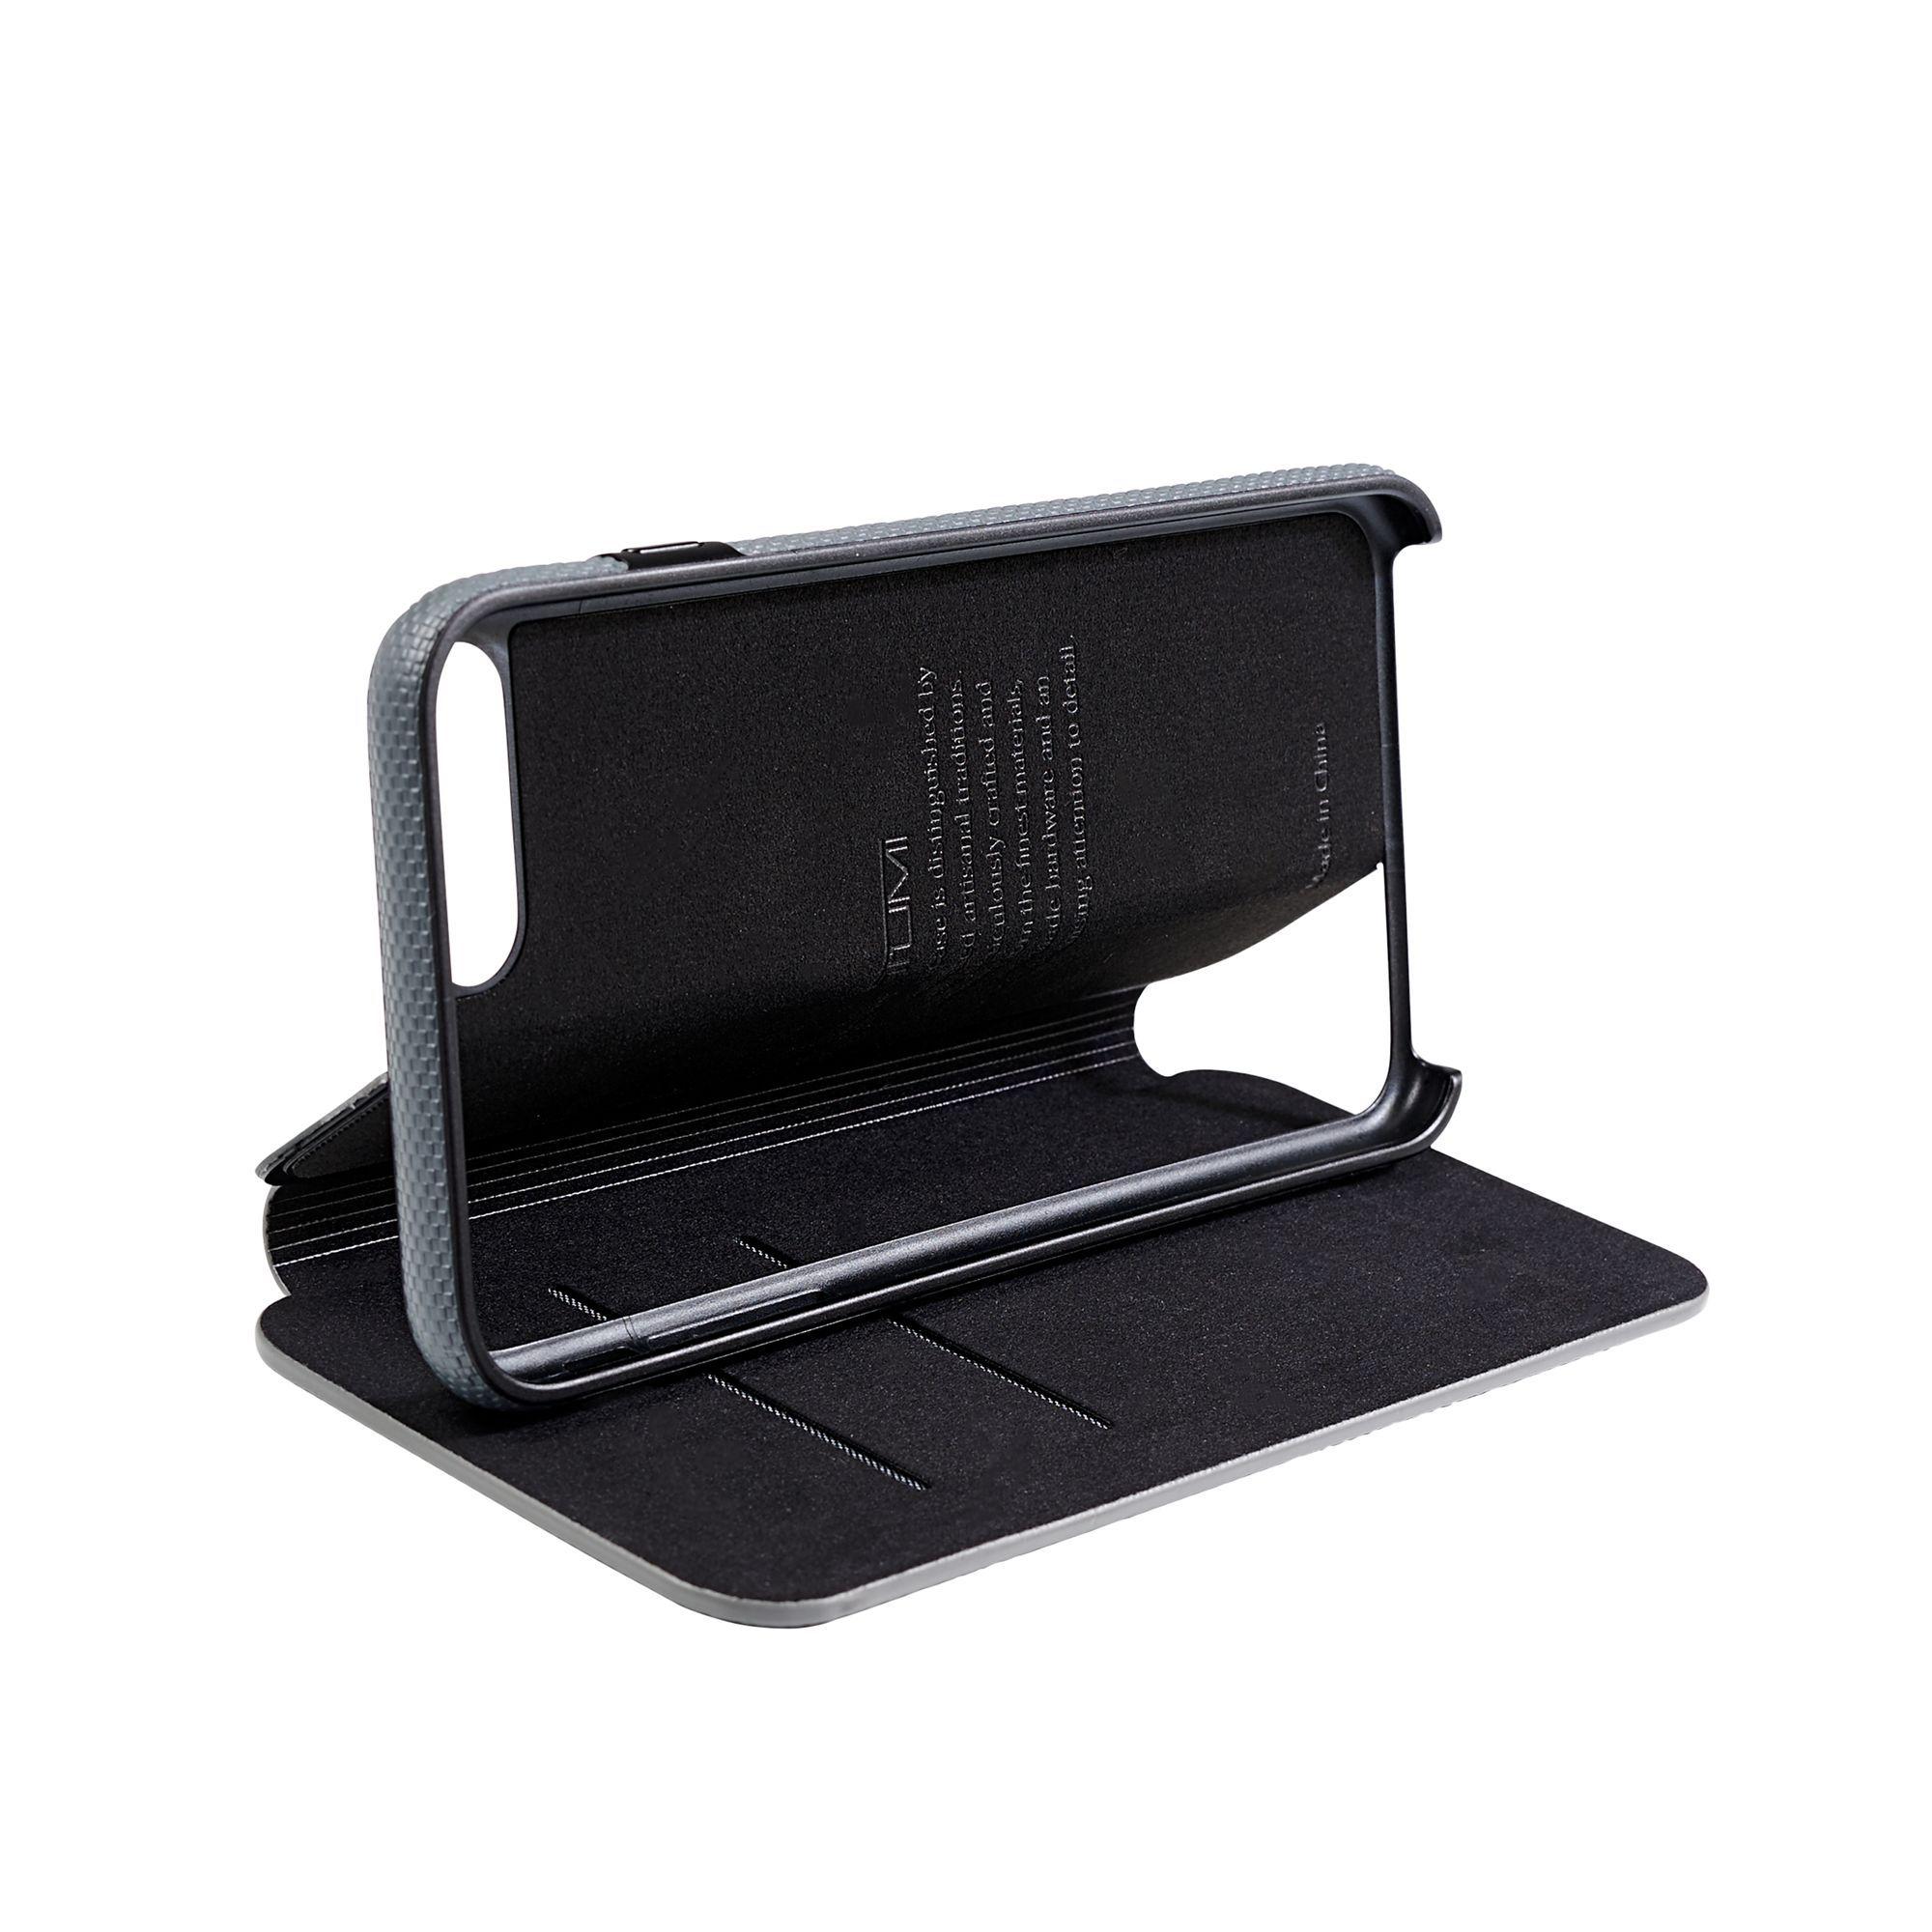 outlet store 16438 1a7e5 Folio Snap Case iPhone 8 Plus - Mobile Accessory - Tumi United ...